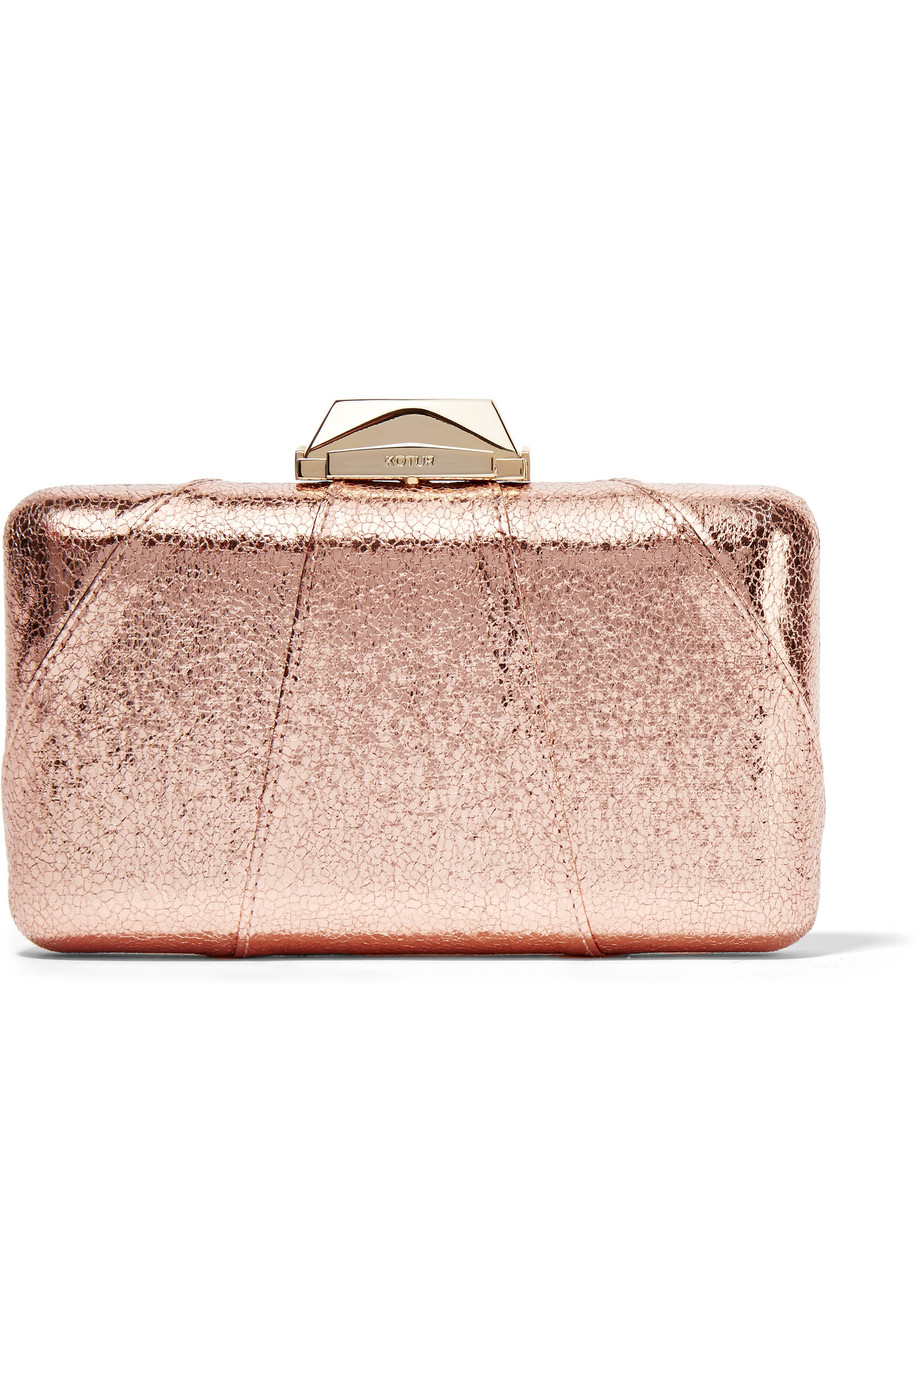 Kotur Espey Metallic Faux Textured-Leather Clutch, Pink/Metallic, Women's